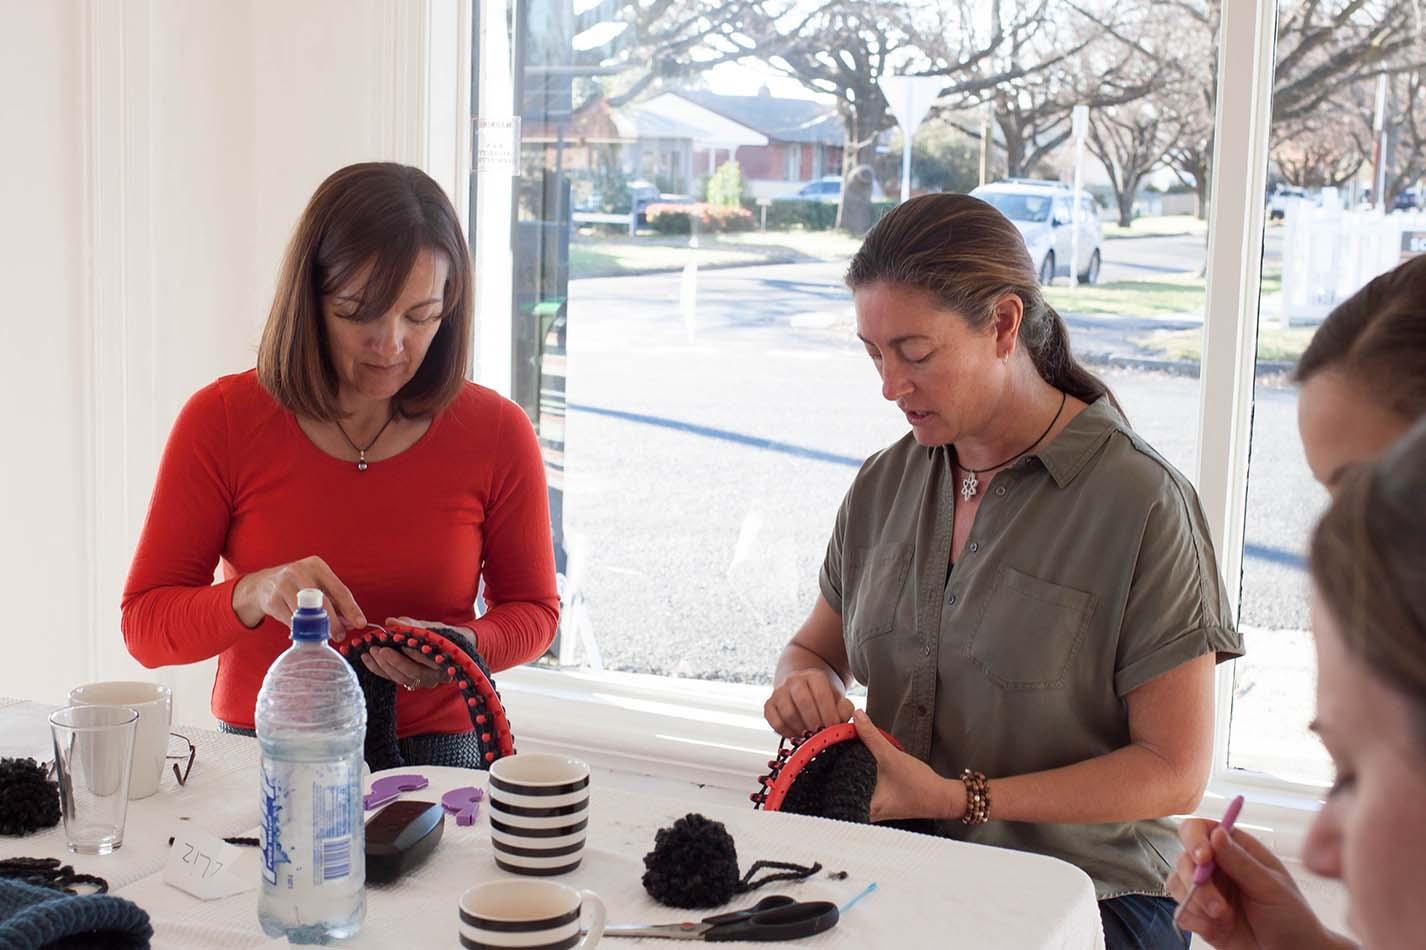 DIY Beanie Workshop - The Corner Store Gallery